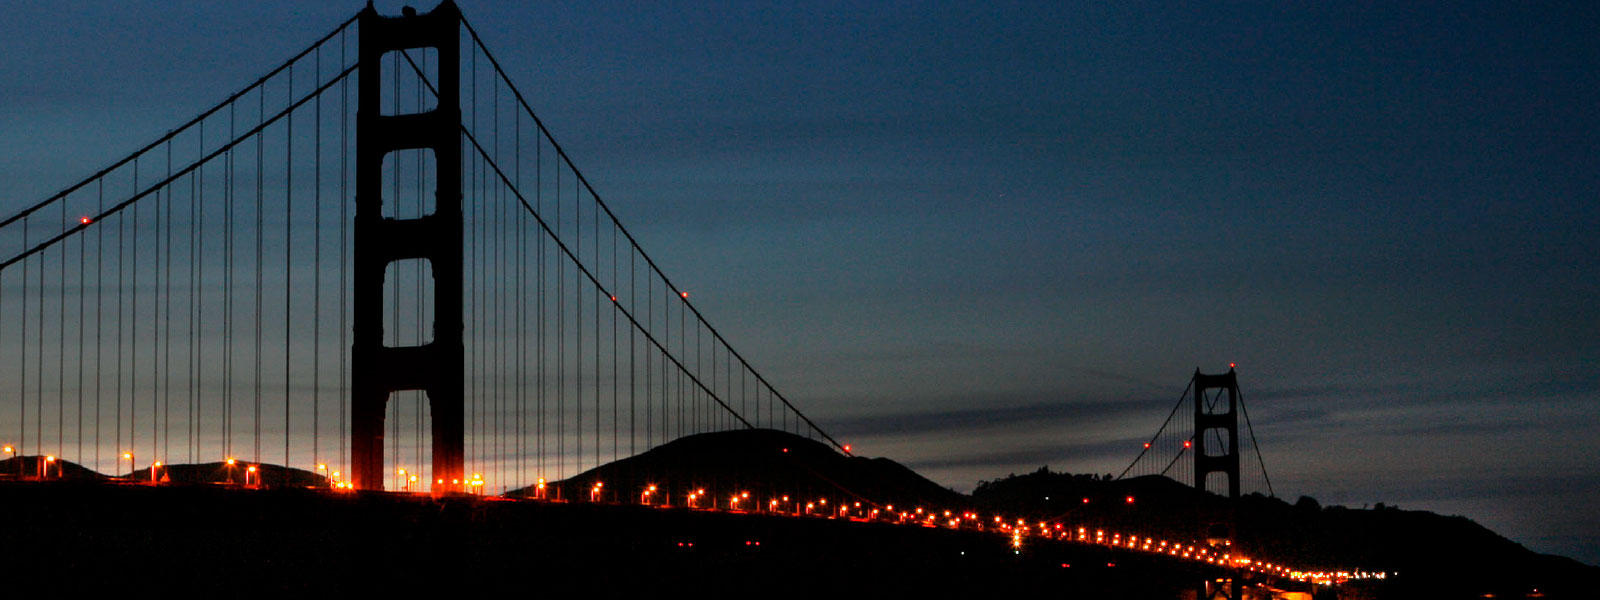 Golden Gate Bridge Off for Earth Hour